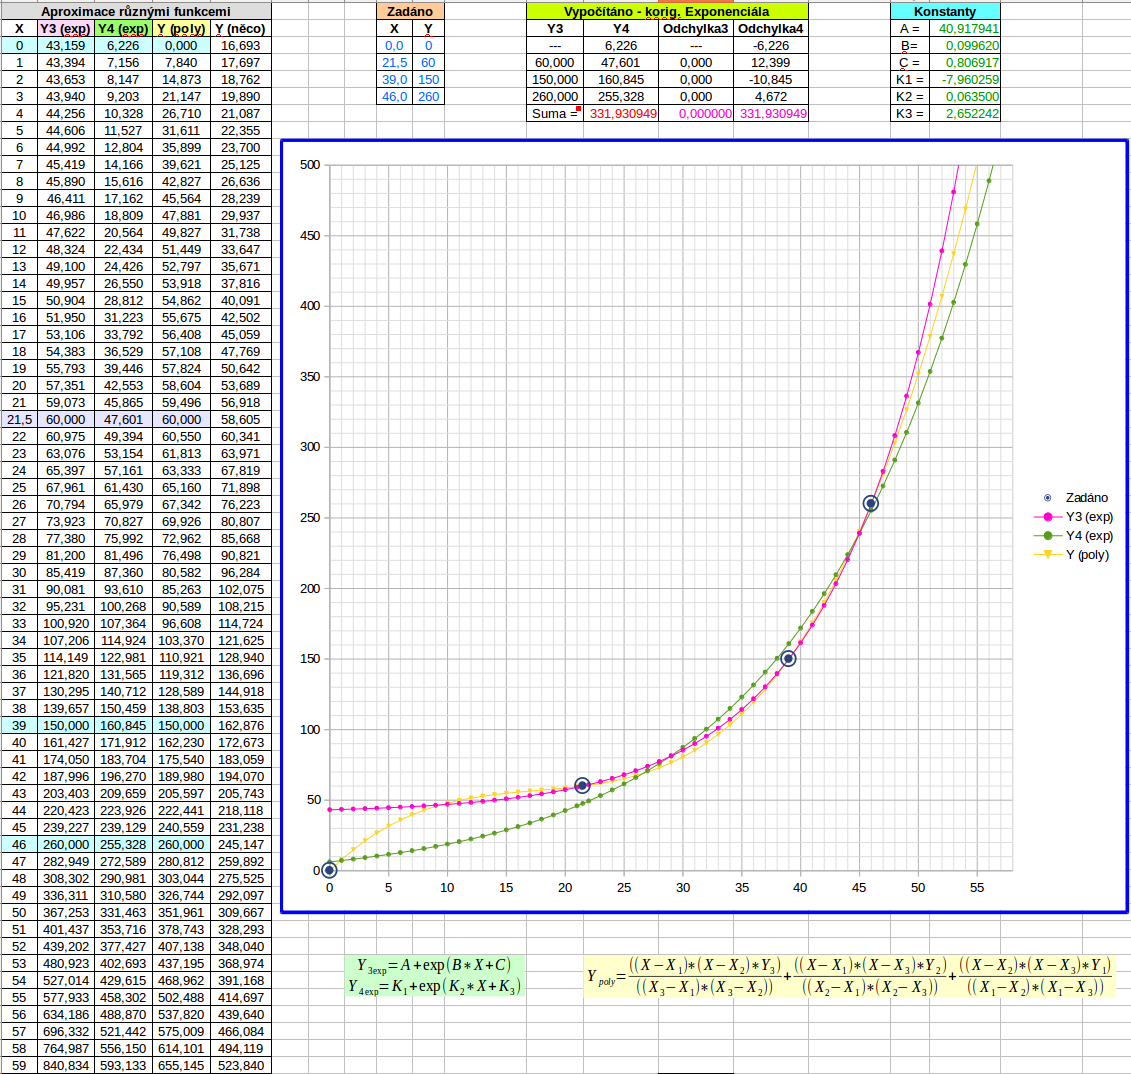 http://forum.matematika.cz/upload3/img/2017-05/99354_Sn%25C3%25ADmek%2Bobrazovky%2Bpo%25C5%2599%25C3%25ADzen%25C3%25BD%2B2017-05-12%2B16-24-07.png